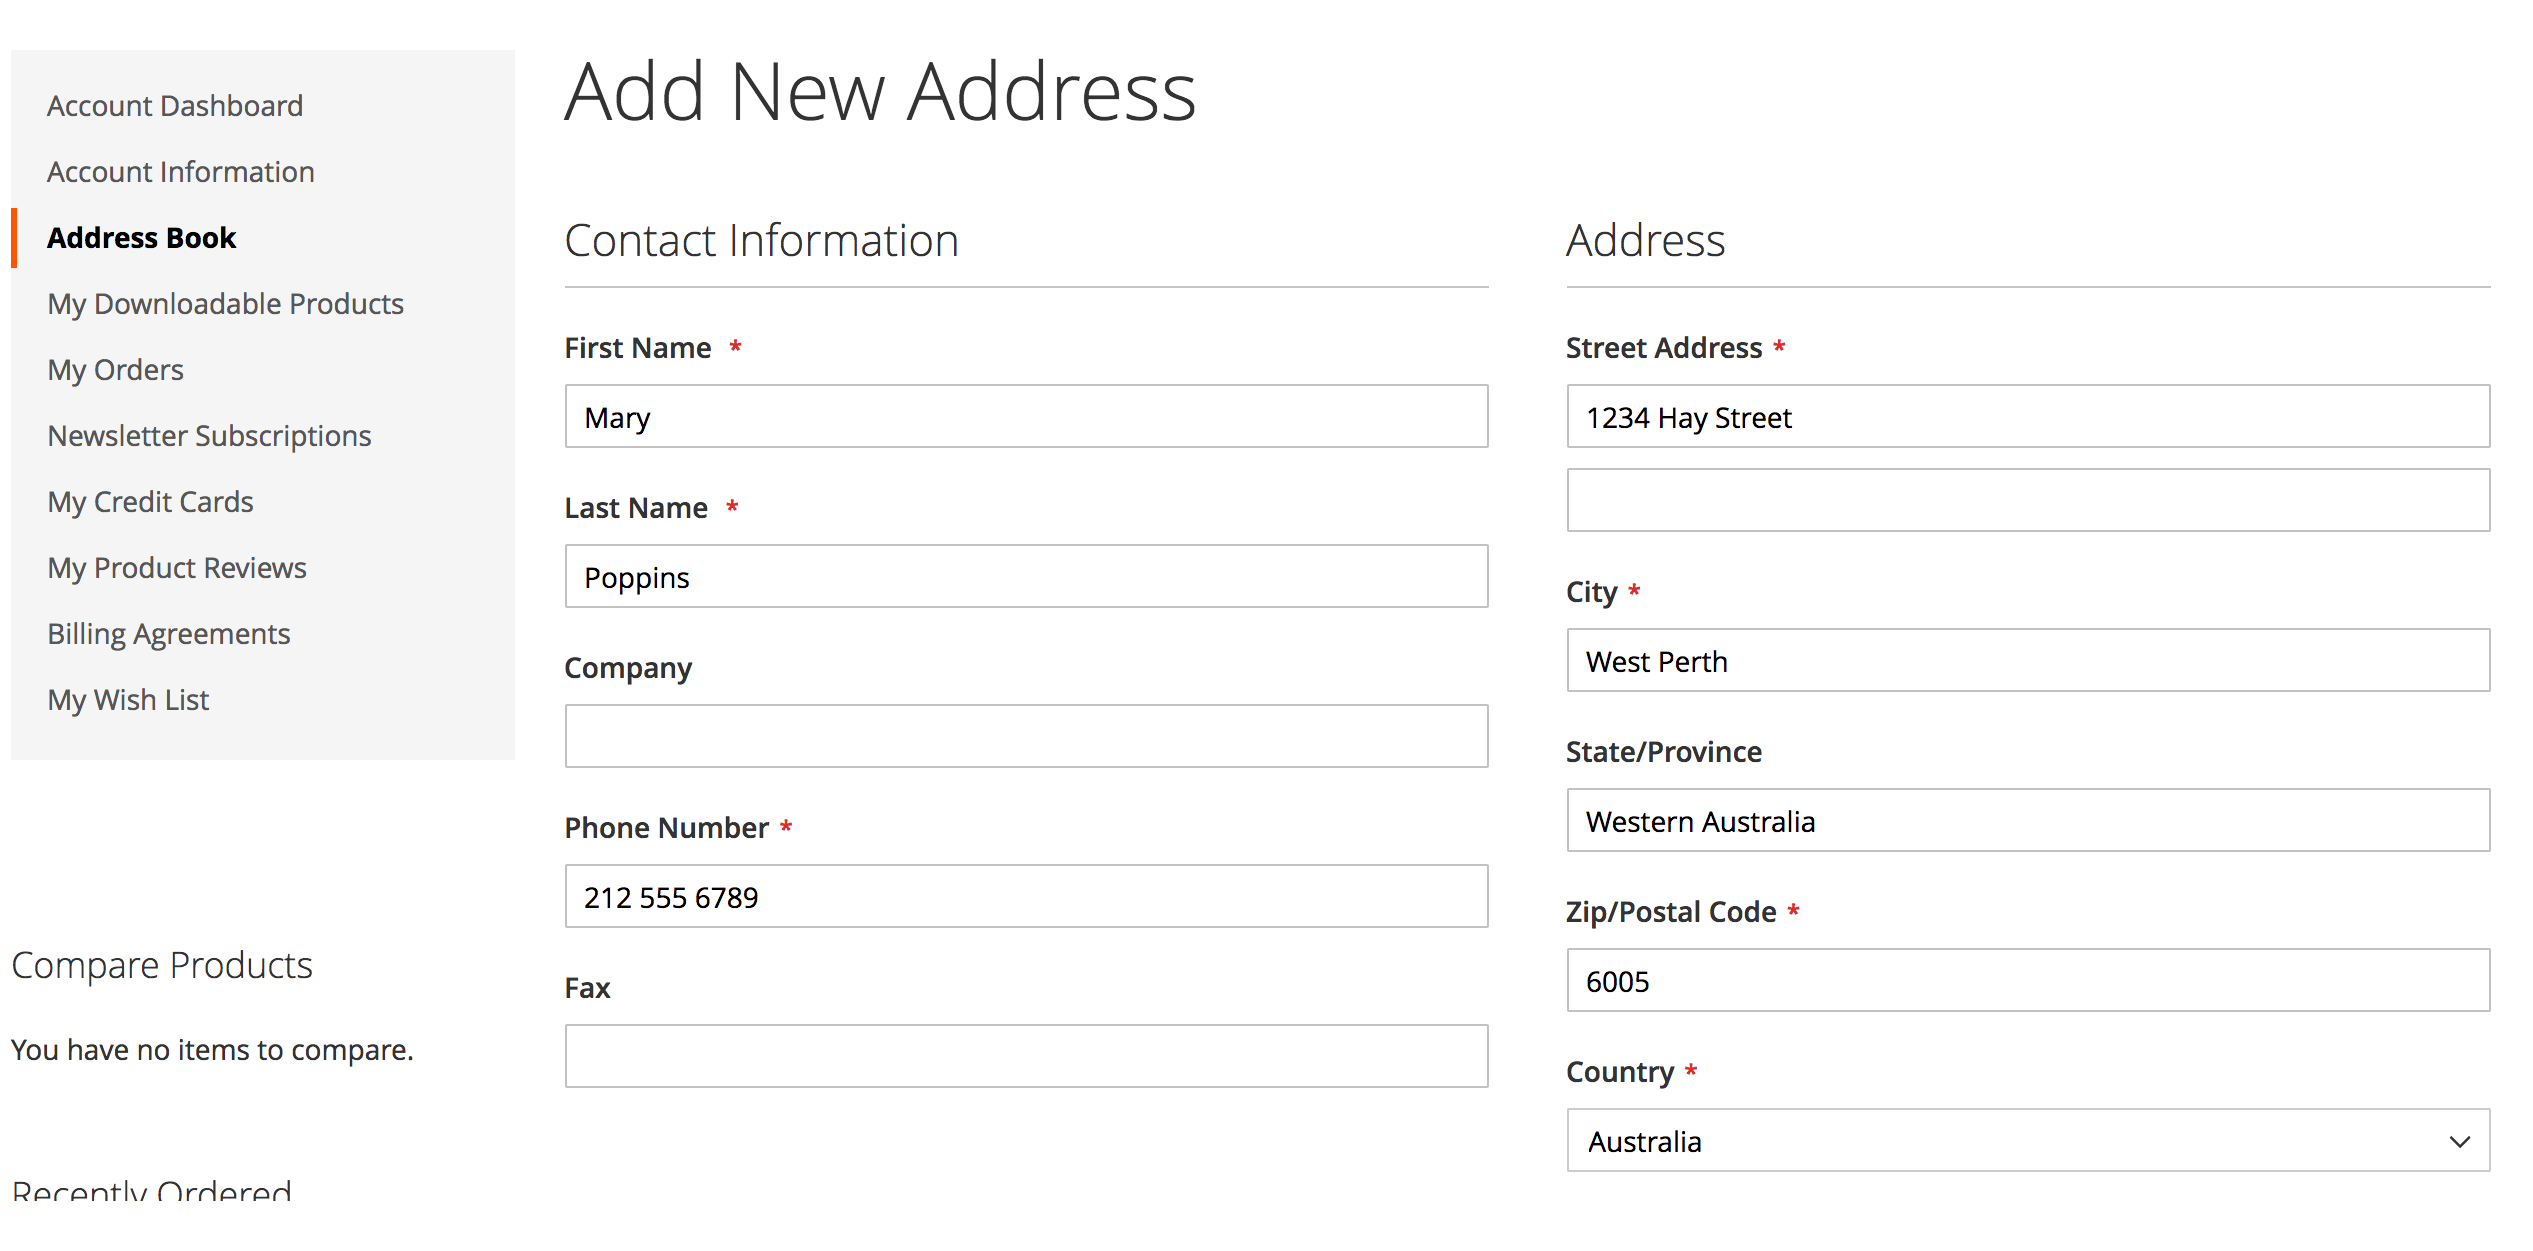 Address Auto-Complete in Address Book